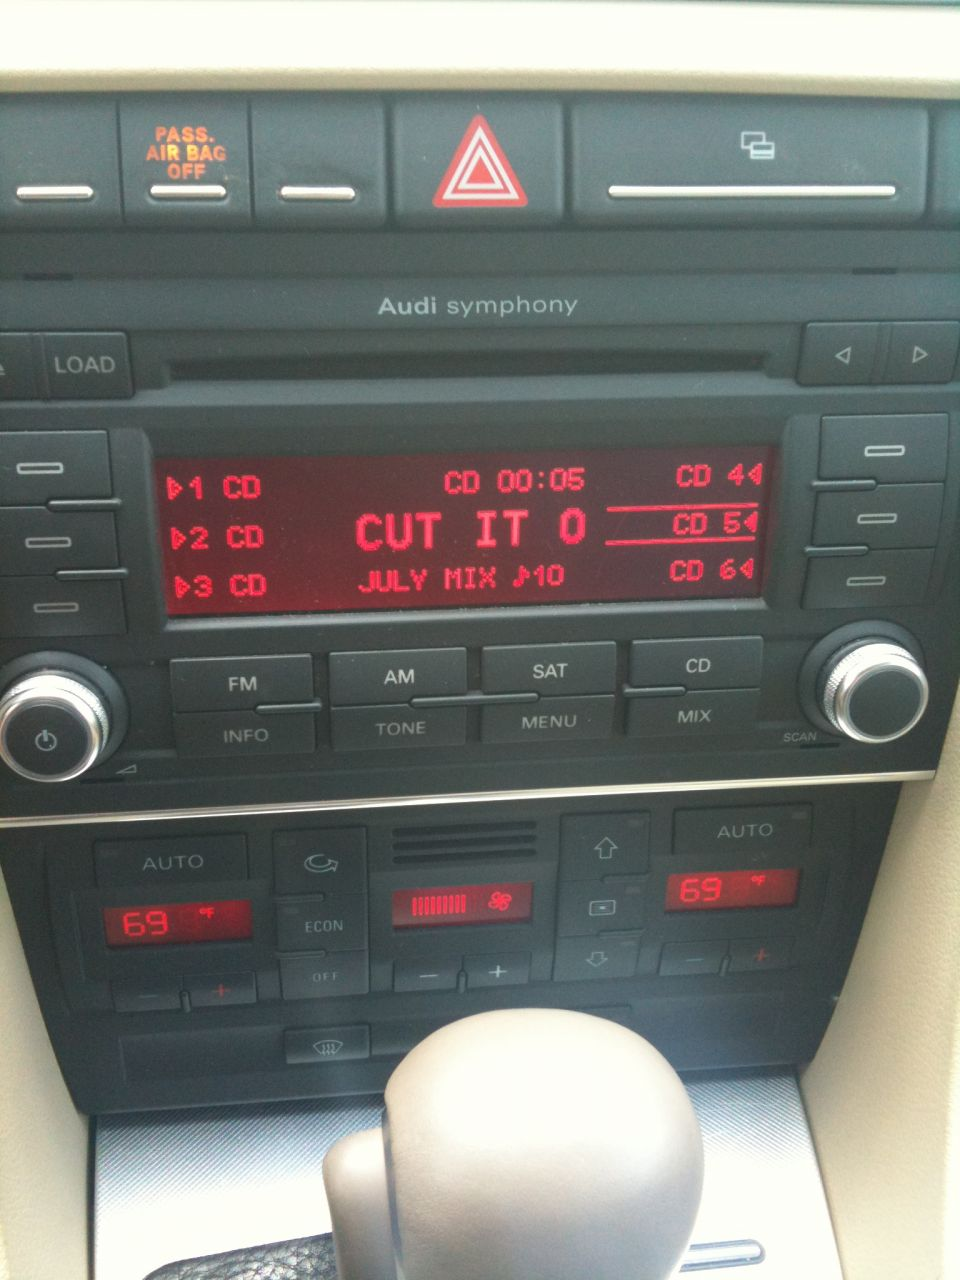 Aftermarket navigation install on bose system